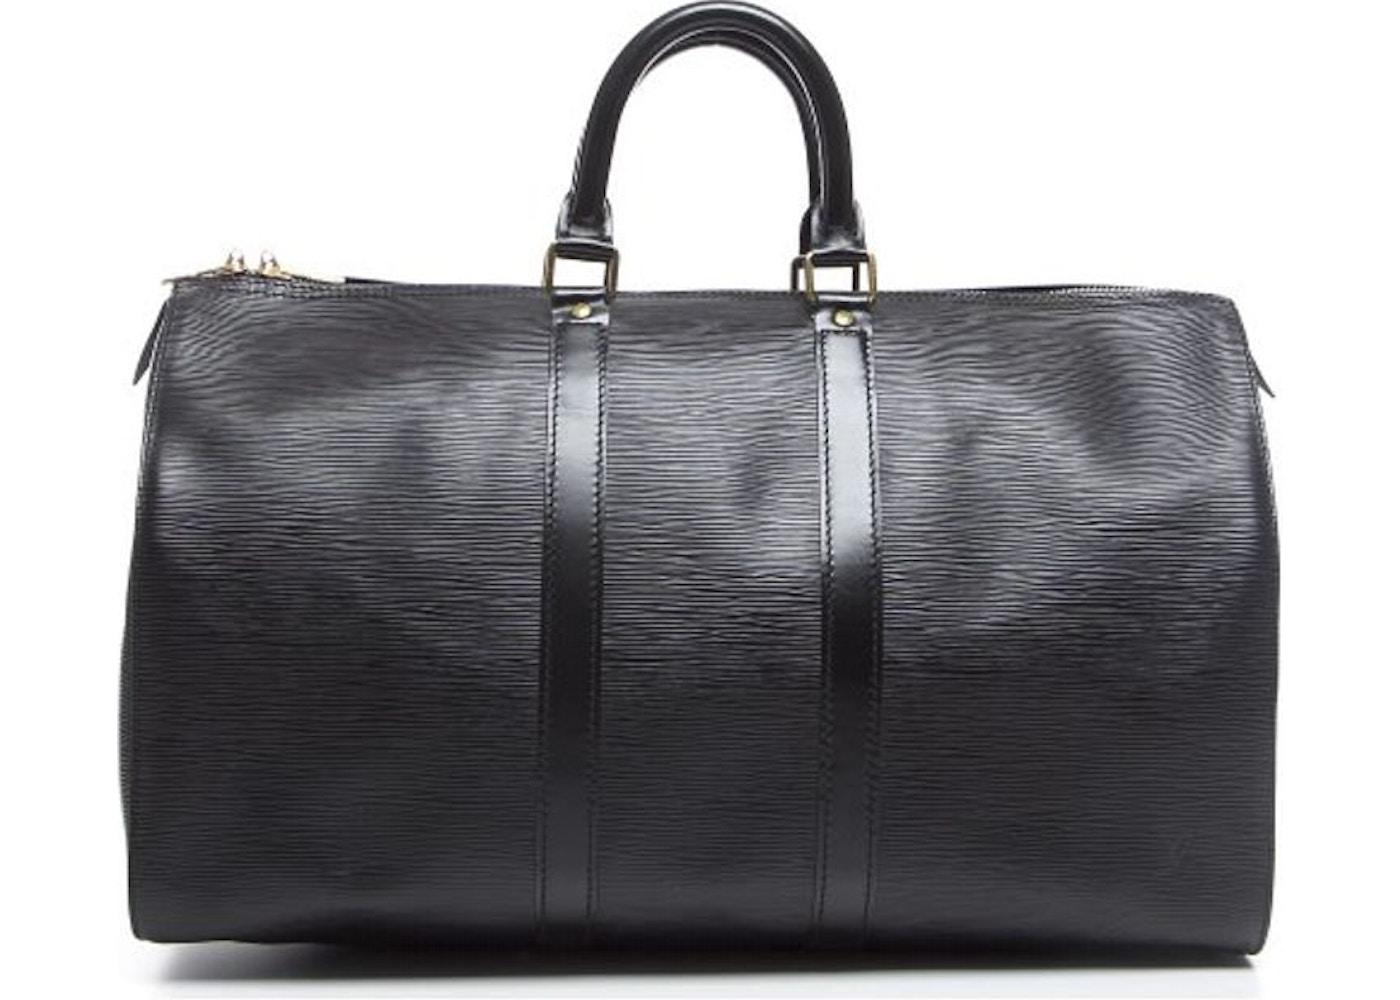 7ad0f460be5b Louis Vuitton Keepall Epi 45 Black. Epi 45 Black